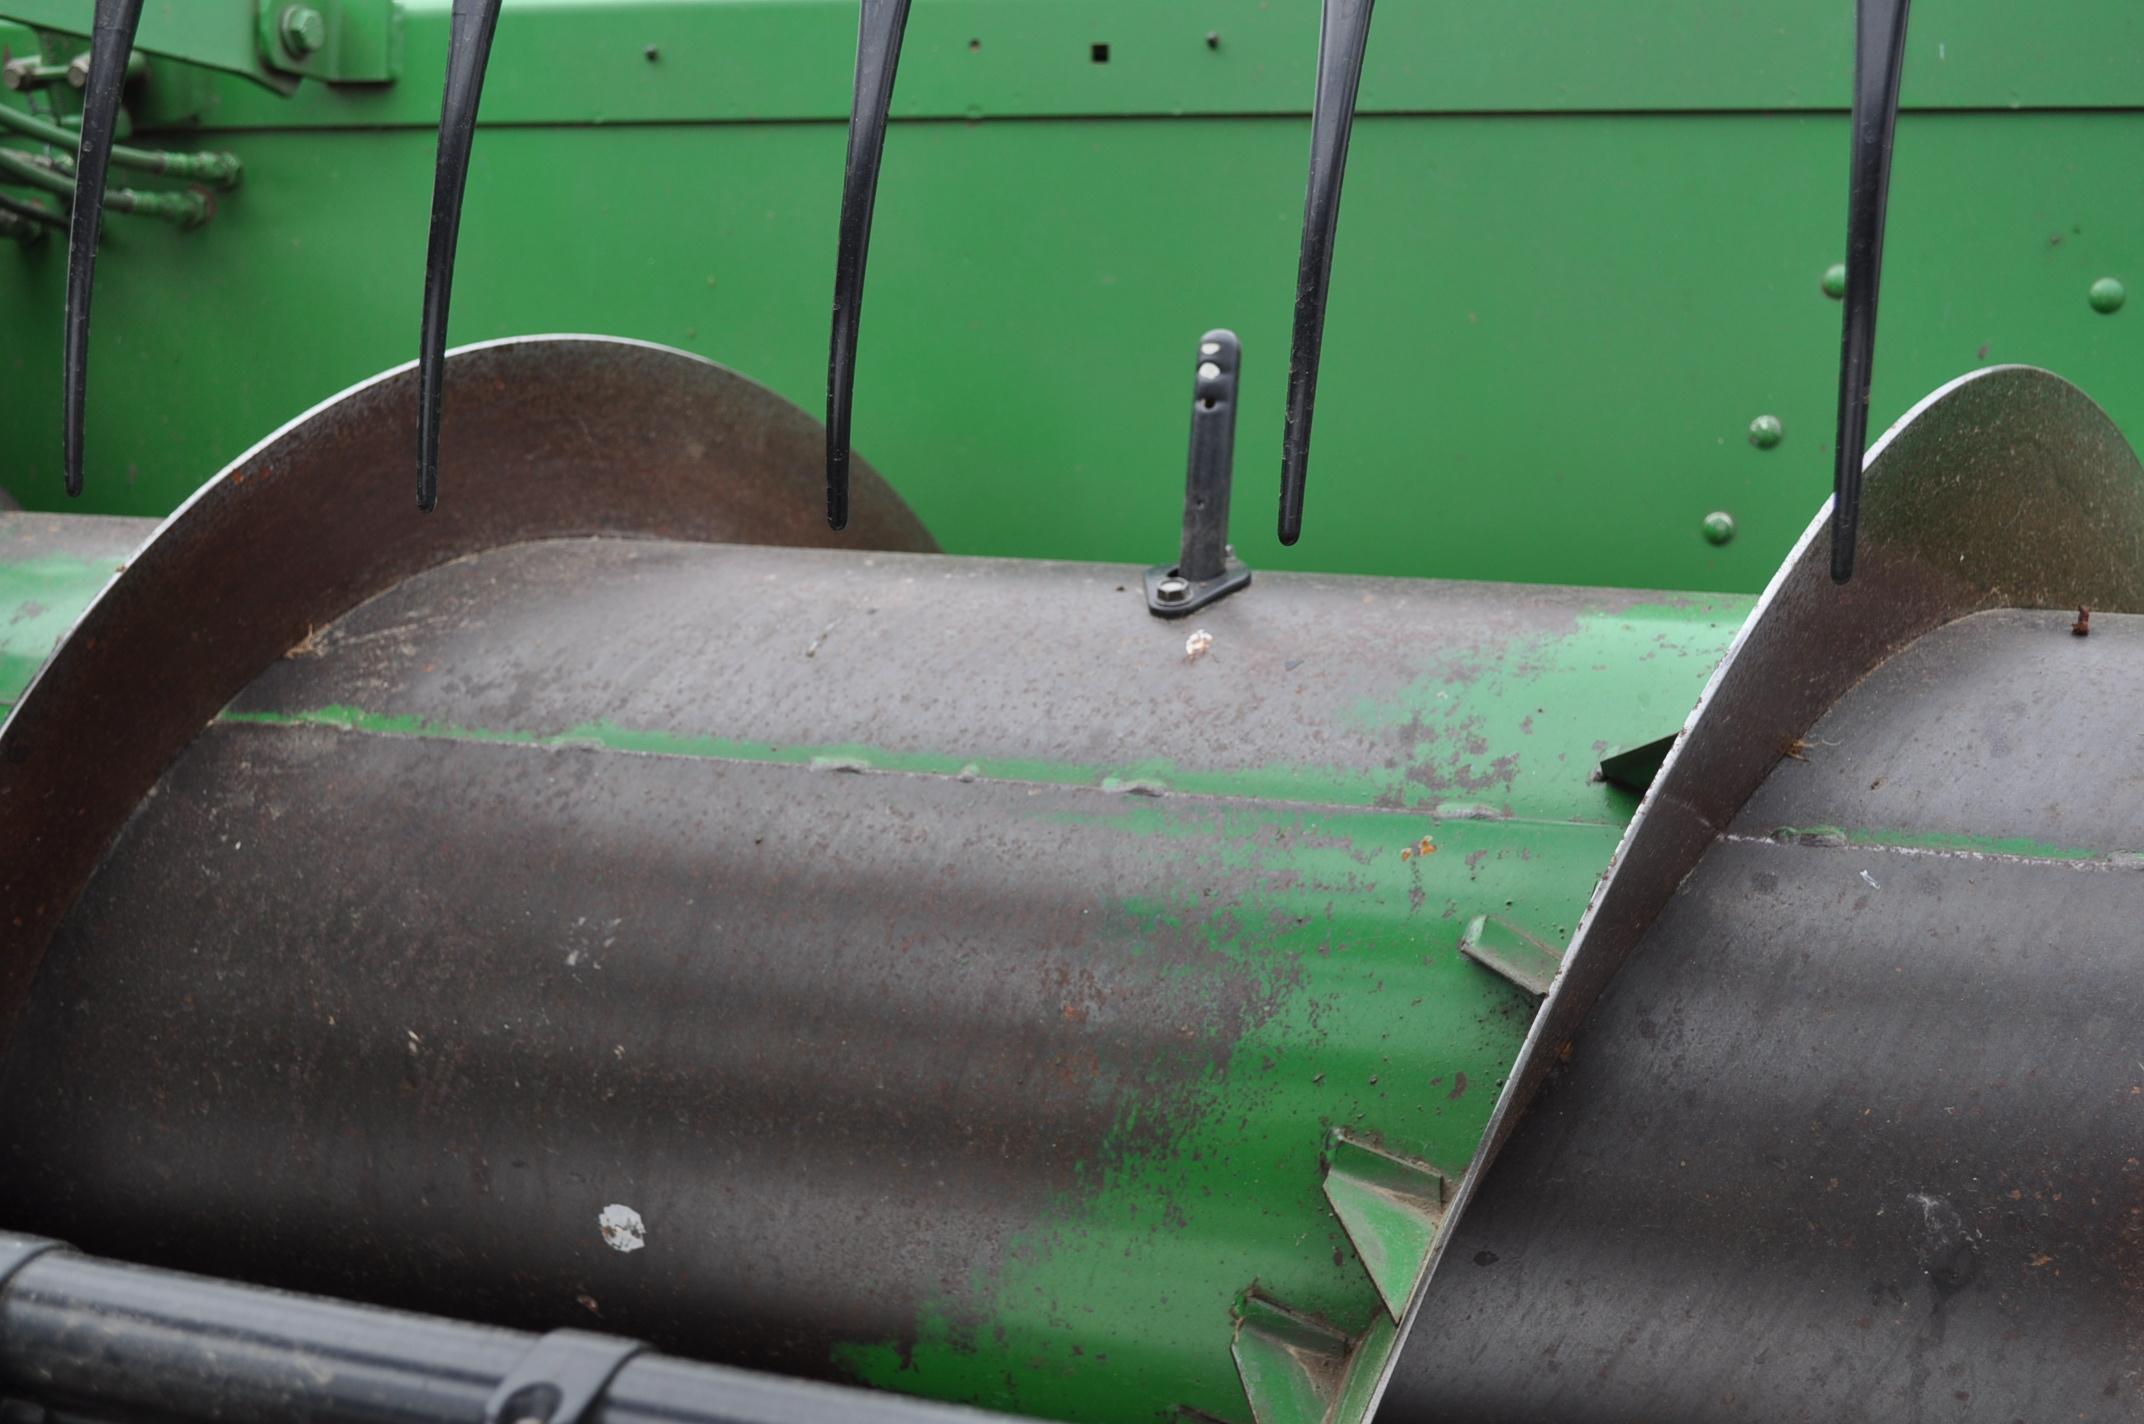 20' John Deere 920F grain head, pto shafts, rock guard, hyd fore/aft, SN 695865 - Image 12 of 12